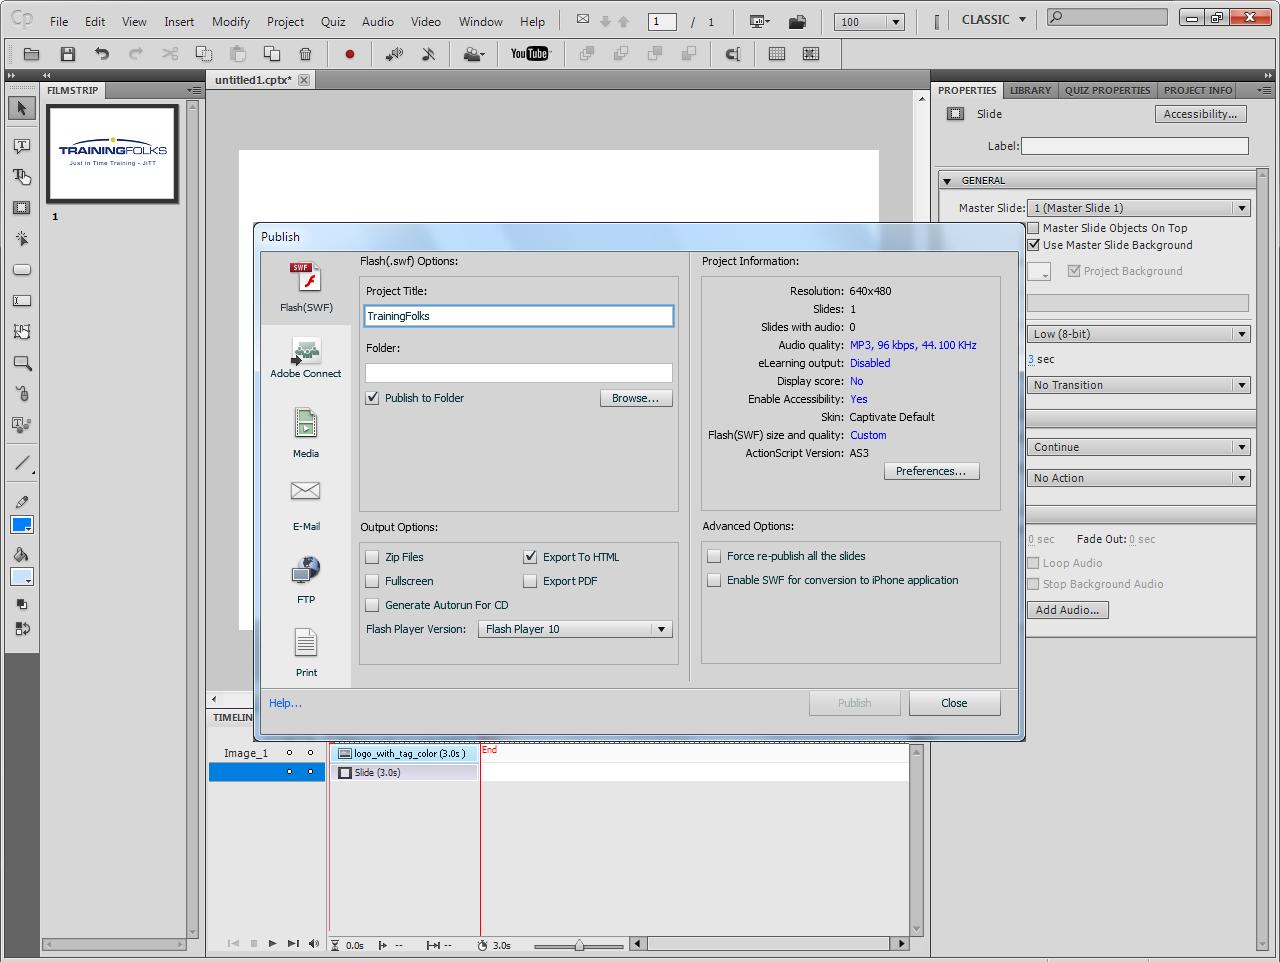 Adobe_Captivate